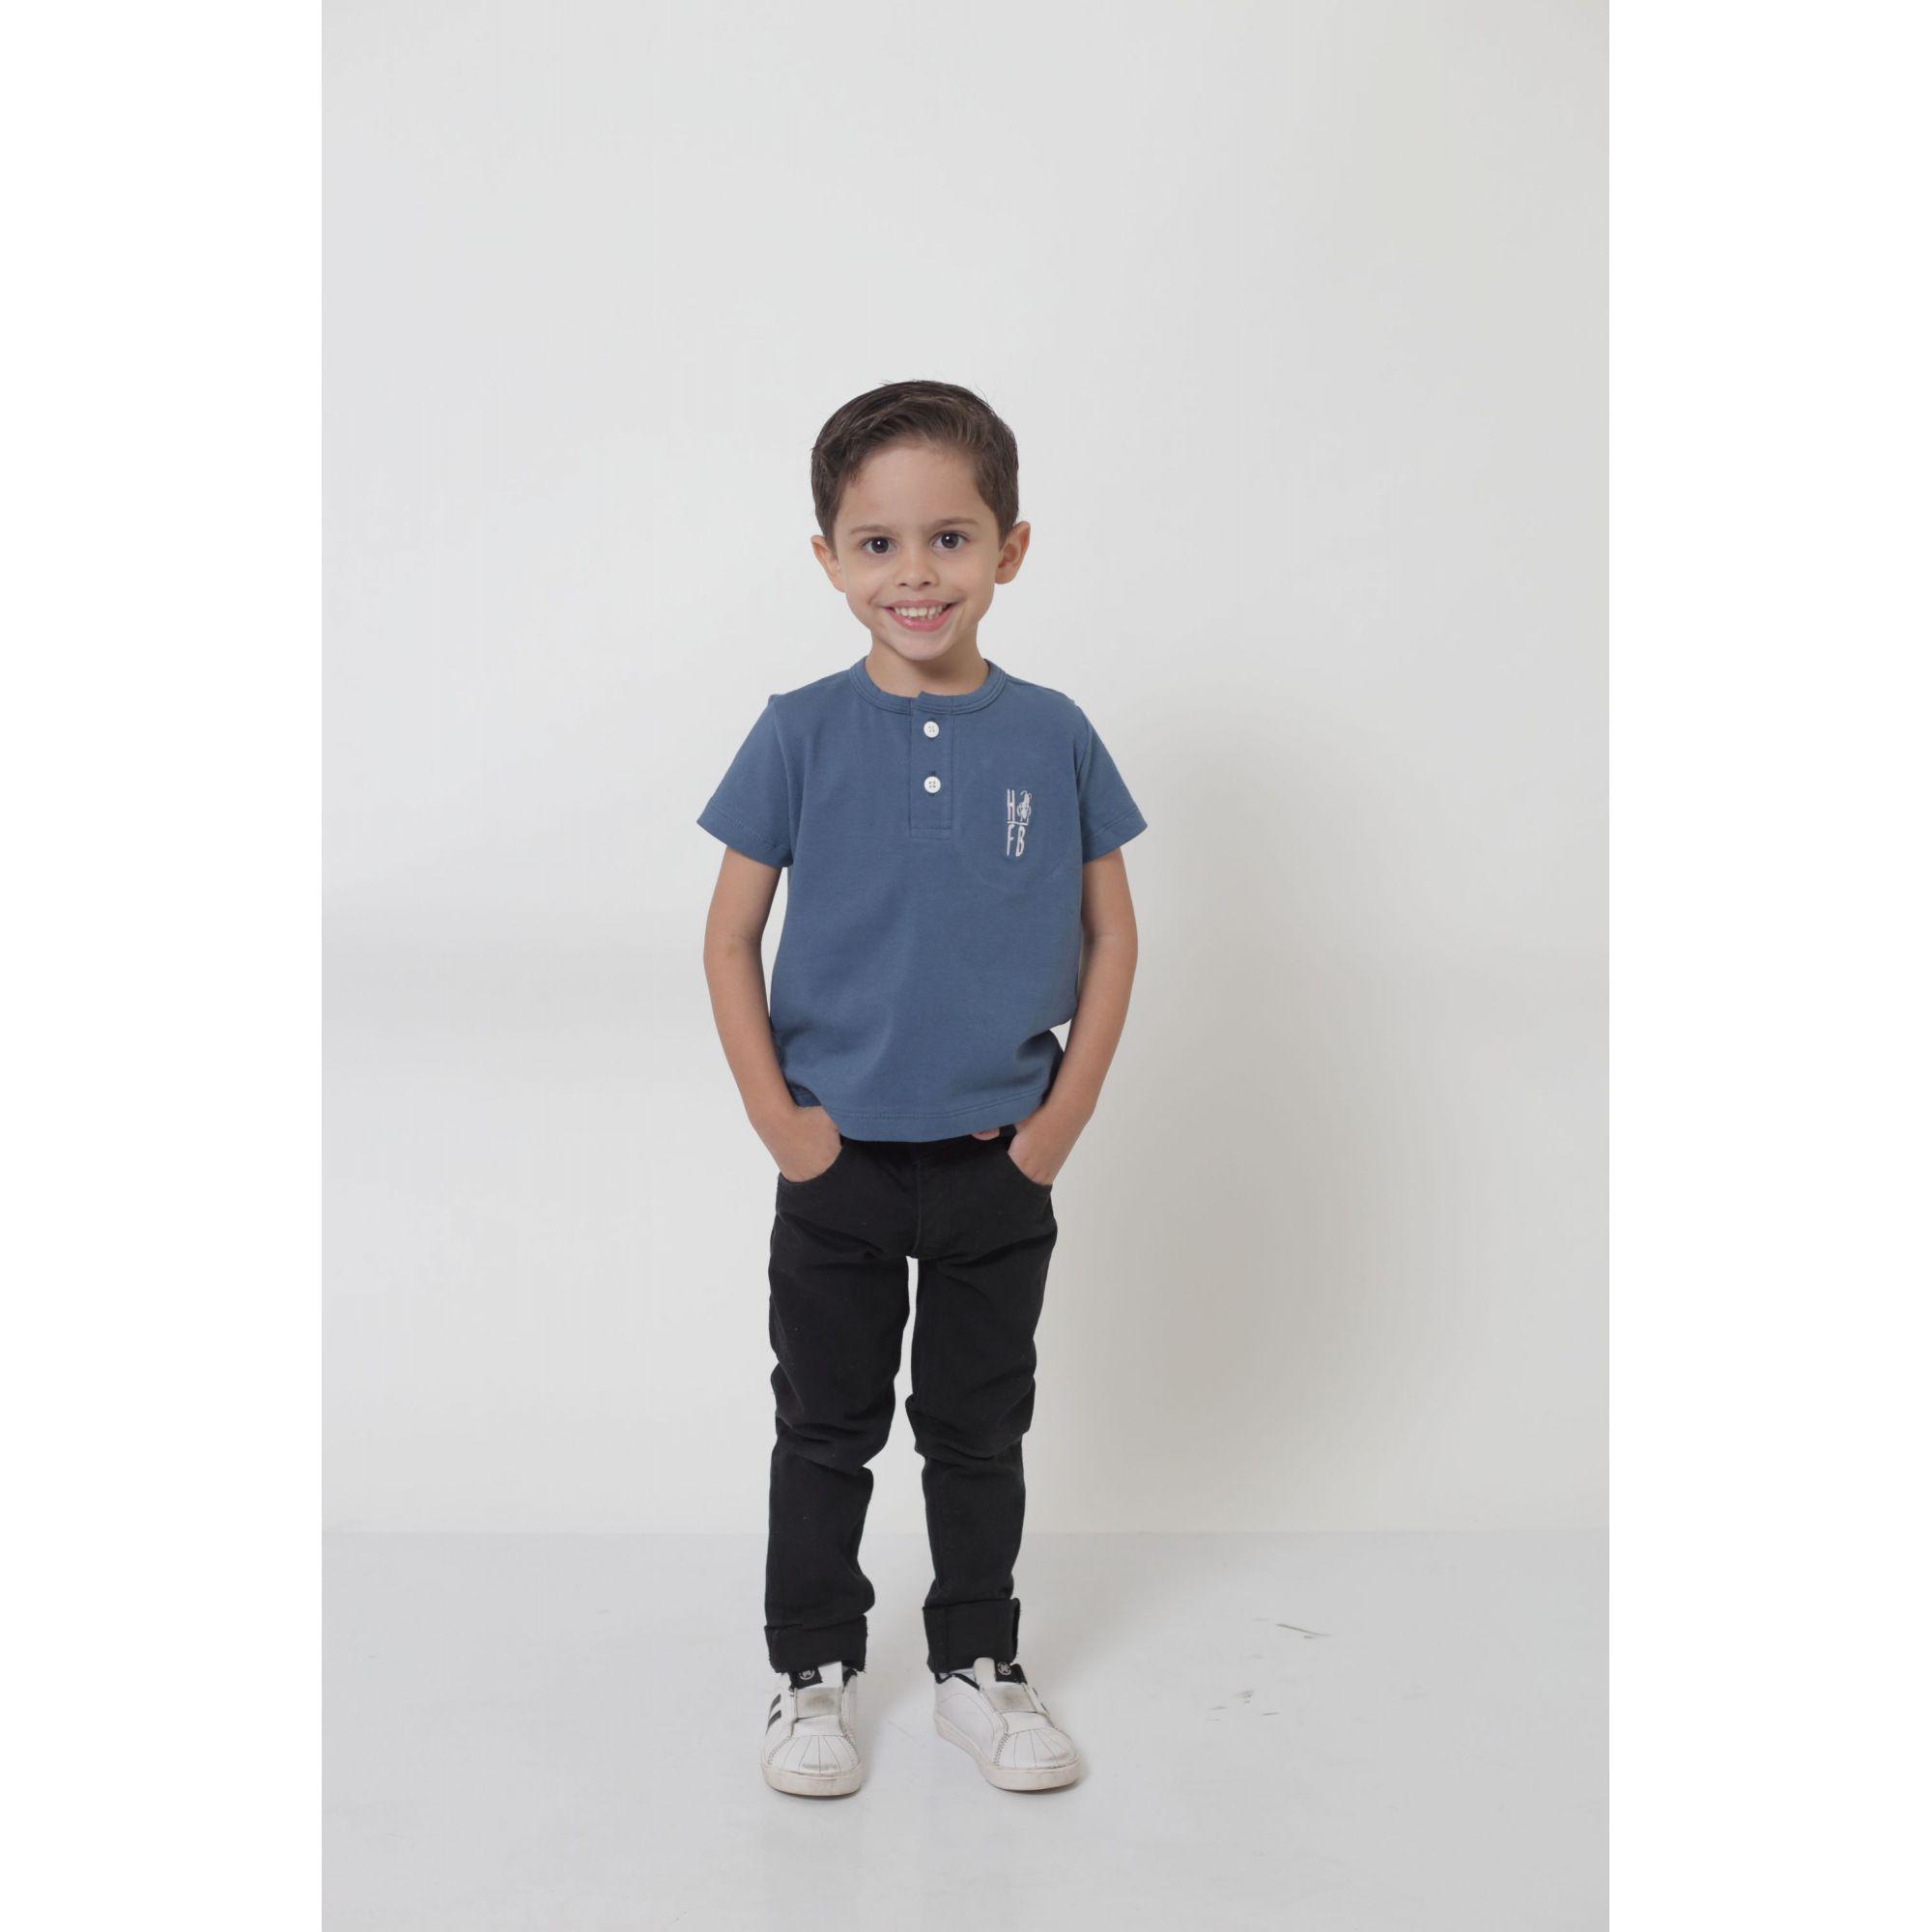 T-Shirt ou Body Unissex - Henley - Infantil - Azul Petróleo